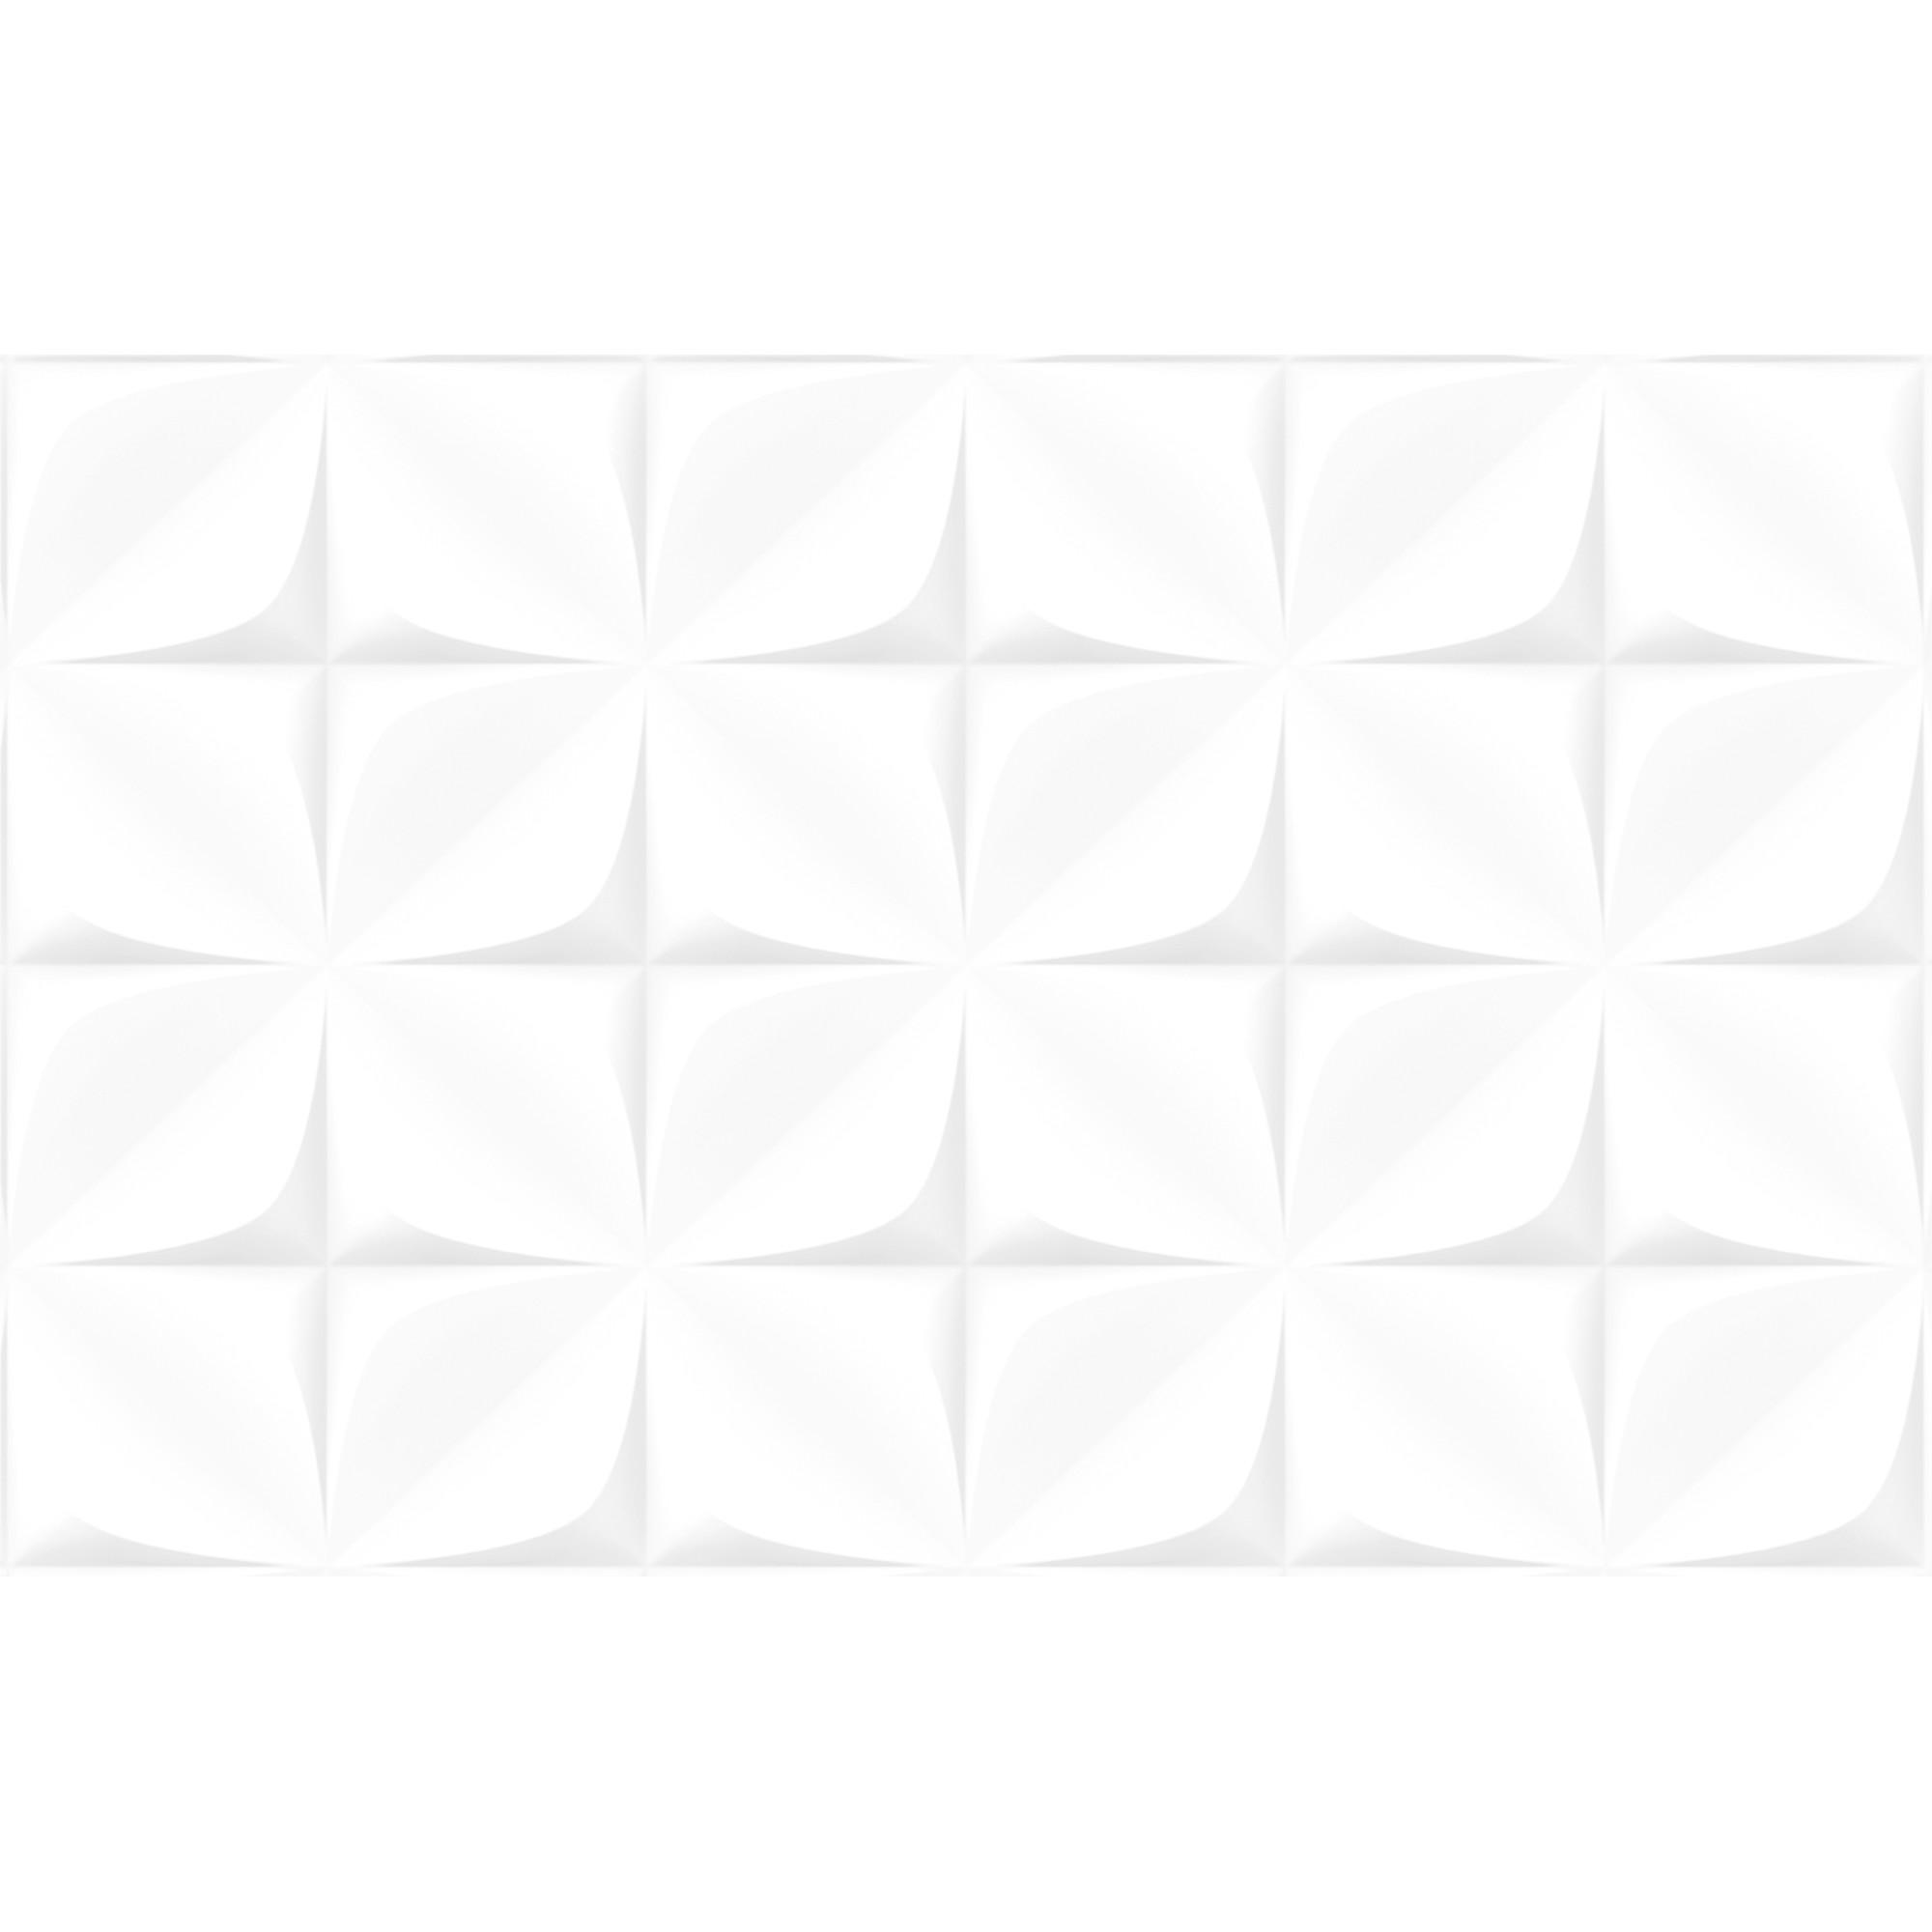 Revestimento Arielle Tipo A Branco 36x58 cm Esmaltado com Alto Relevo 232m Tecnologia de Impressao Digital HD